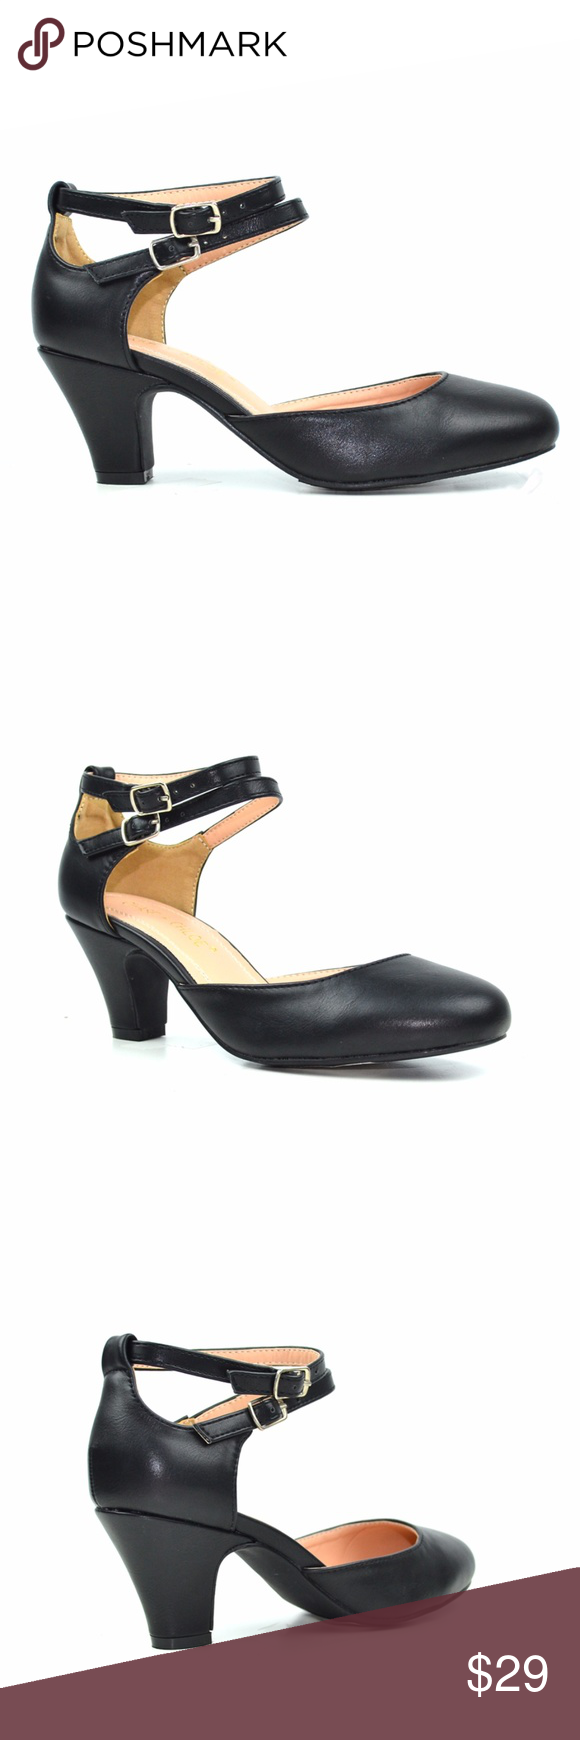 c34959ec0b9 Chase & Chloe Mina Black D'orsay Low Heel Pump A dramatic round toe ...